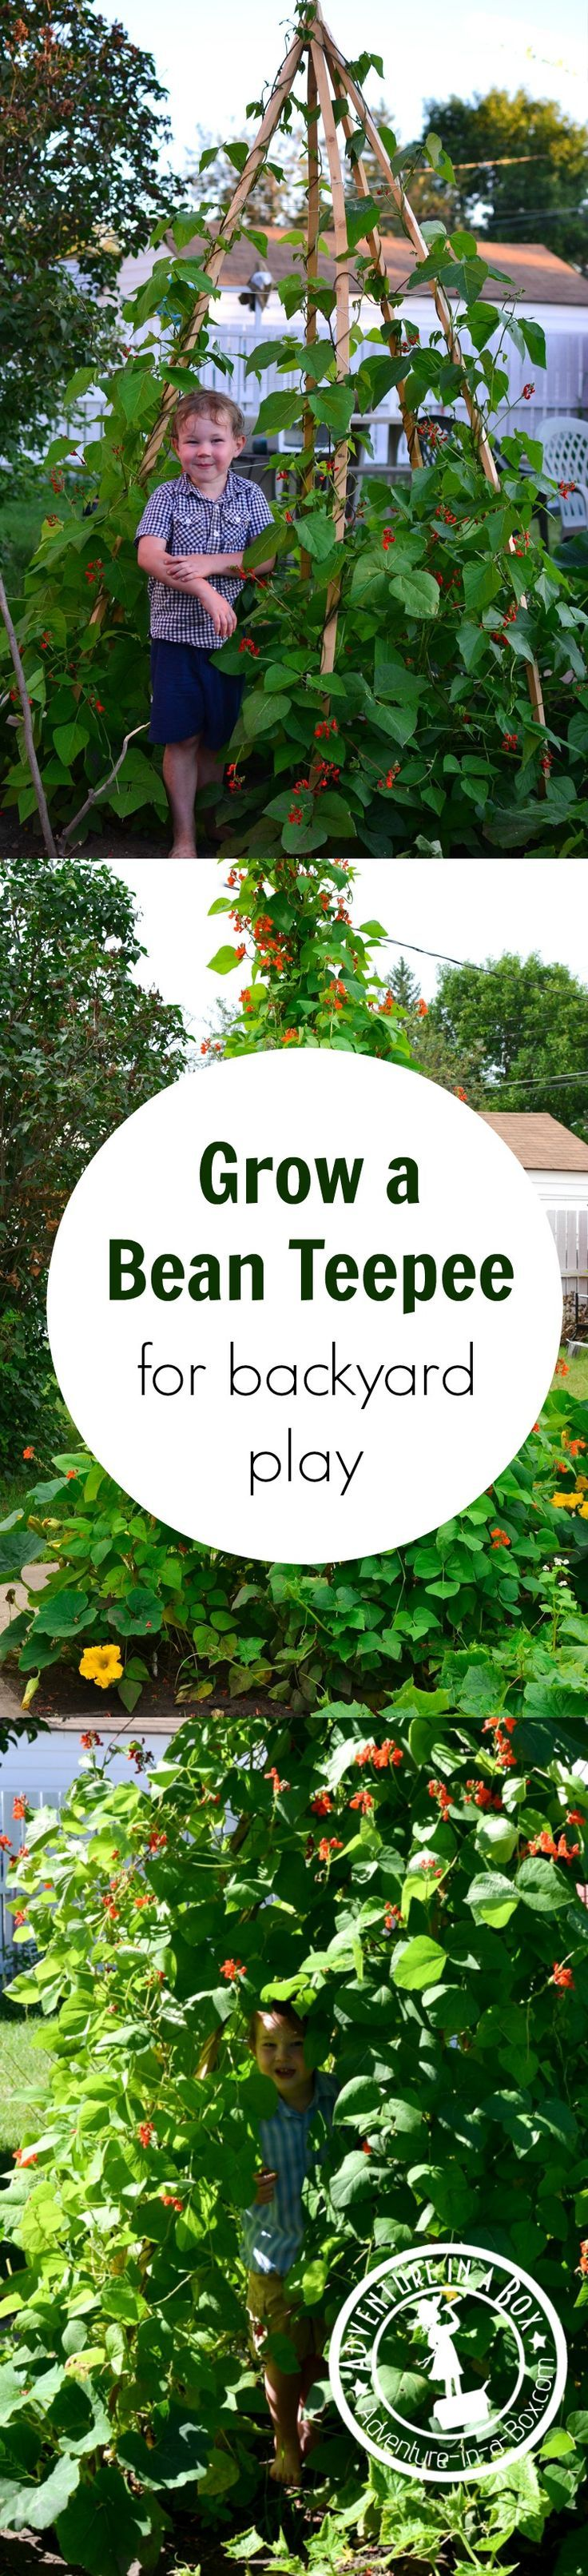 How to Make a Bean Teepee for Backyard Play | Garden ...